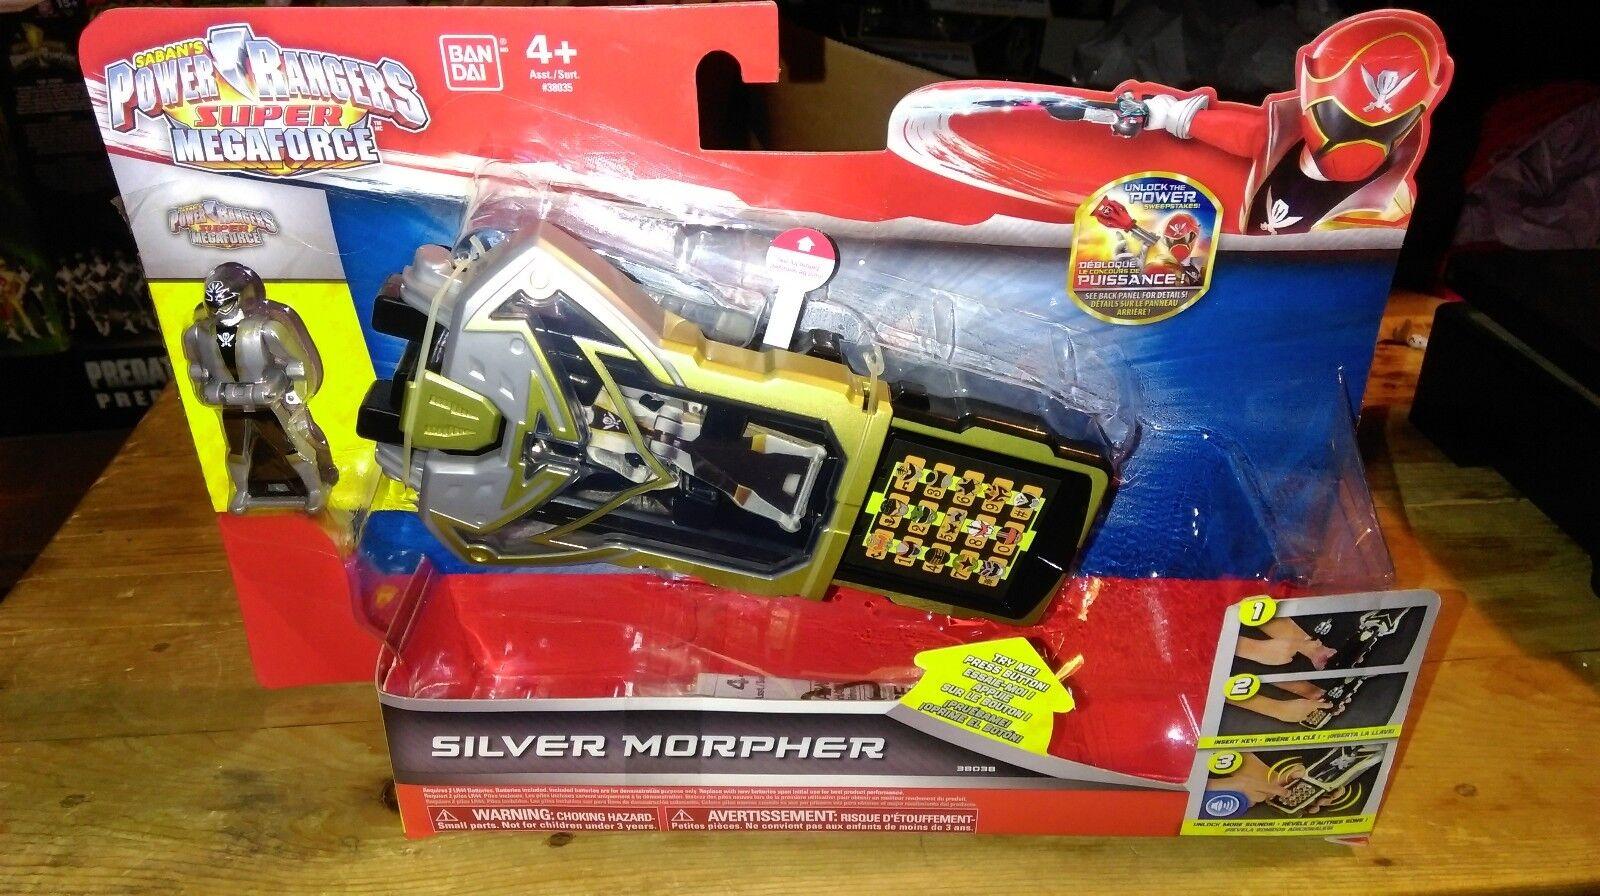 orden ahora disfrutar de gran descuento Power Rangers súper Megaforce Plata Plata Plata Ranger Morpher Nuevo  en stock